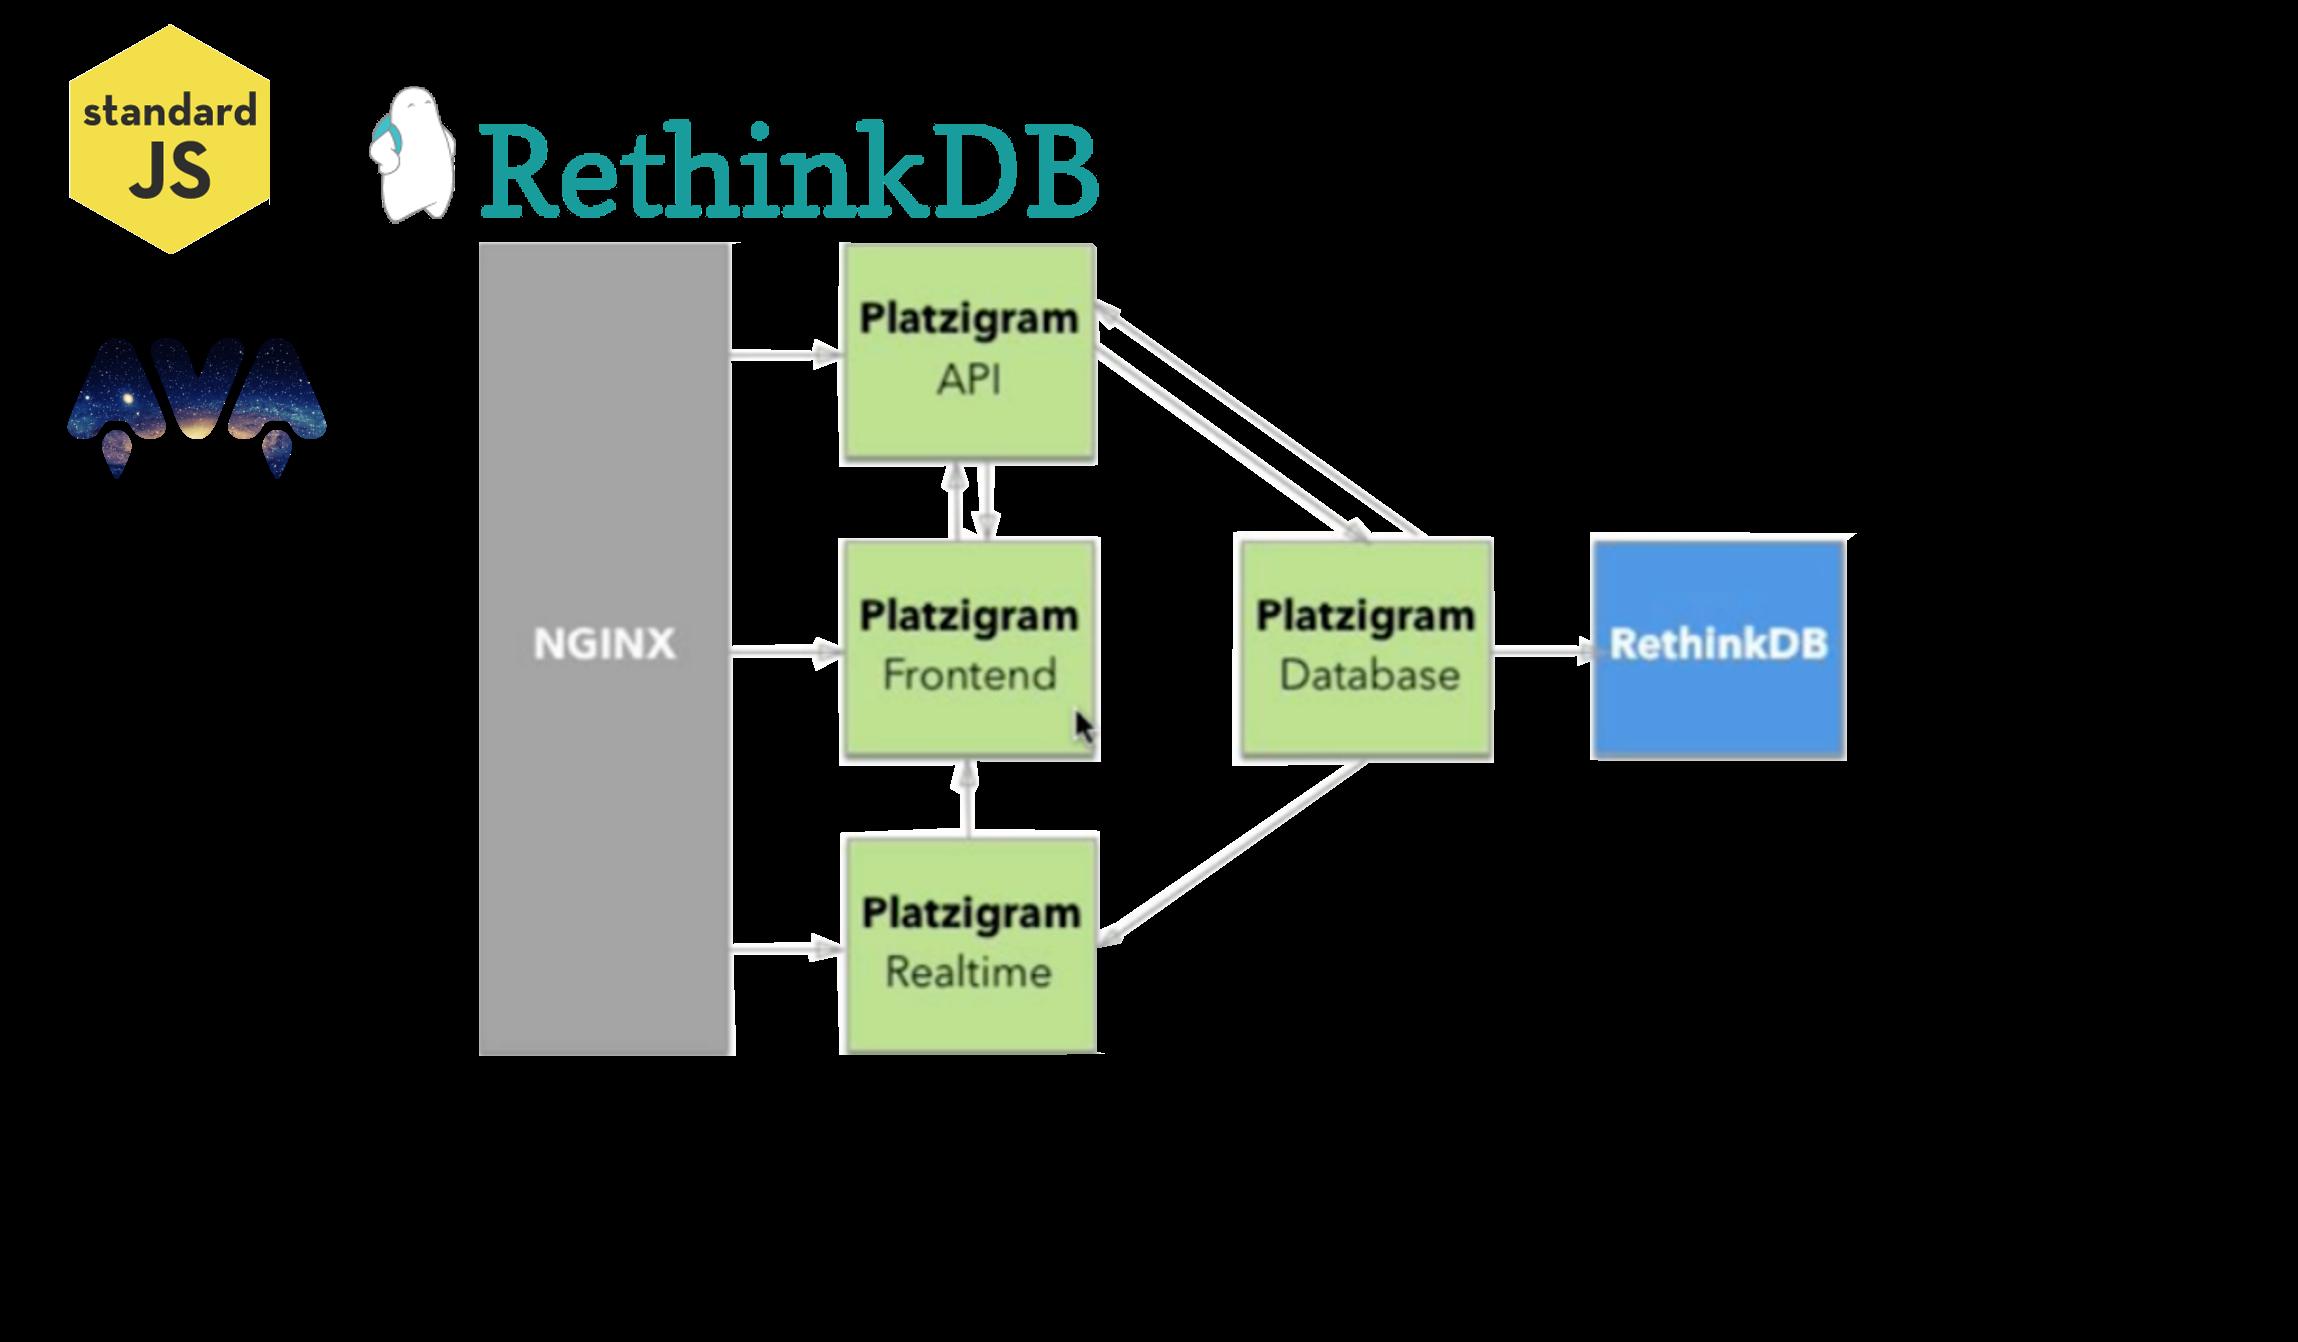 platzigram-db - Backend Platzigram, módulo de base de datos con RethinkDB